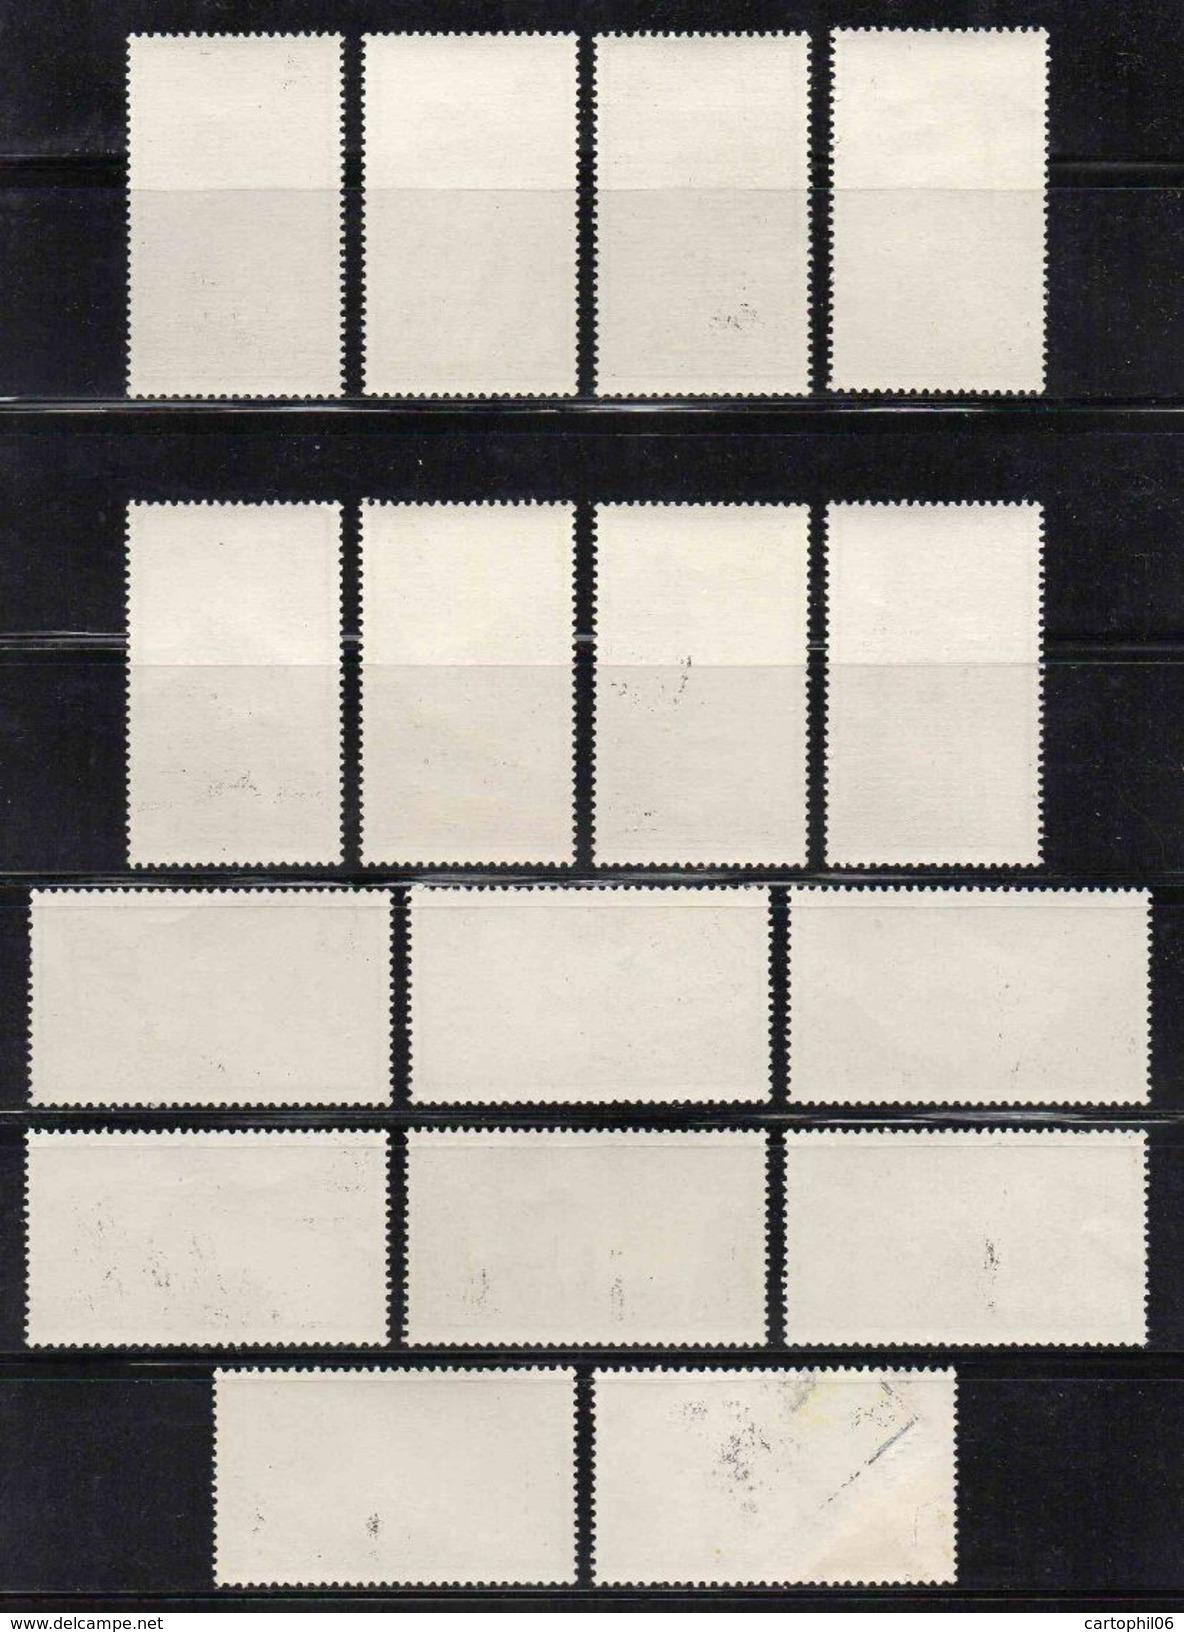 - CHINE - Yvert & Tellier N° 1501/16 Neufs ** - Série Complète PAYSAGES DU HOUANGSHAN 1963 - Cote 1000 EUR - - Ungebraucht